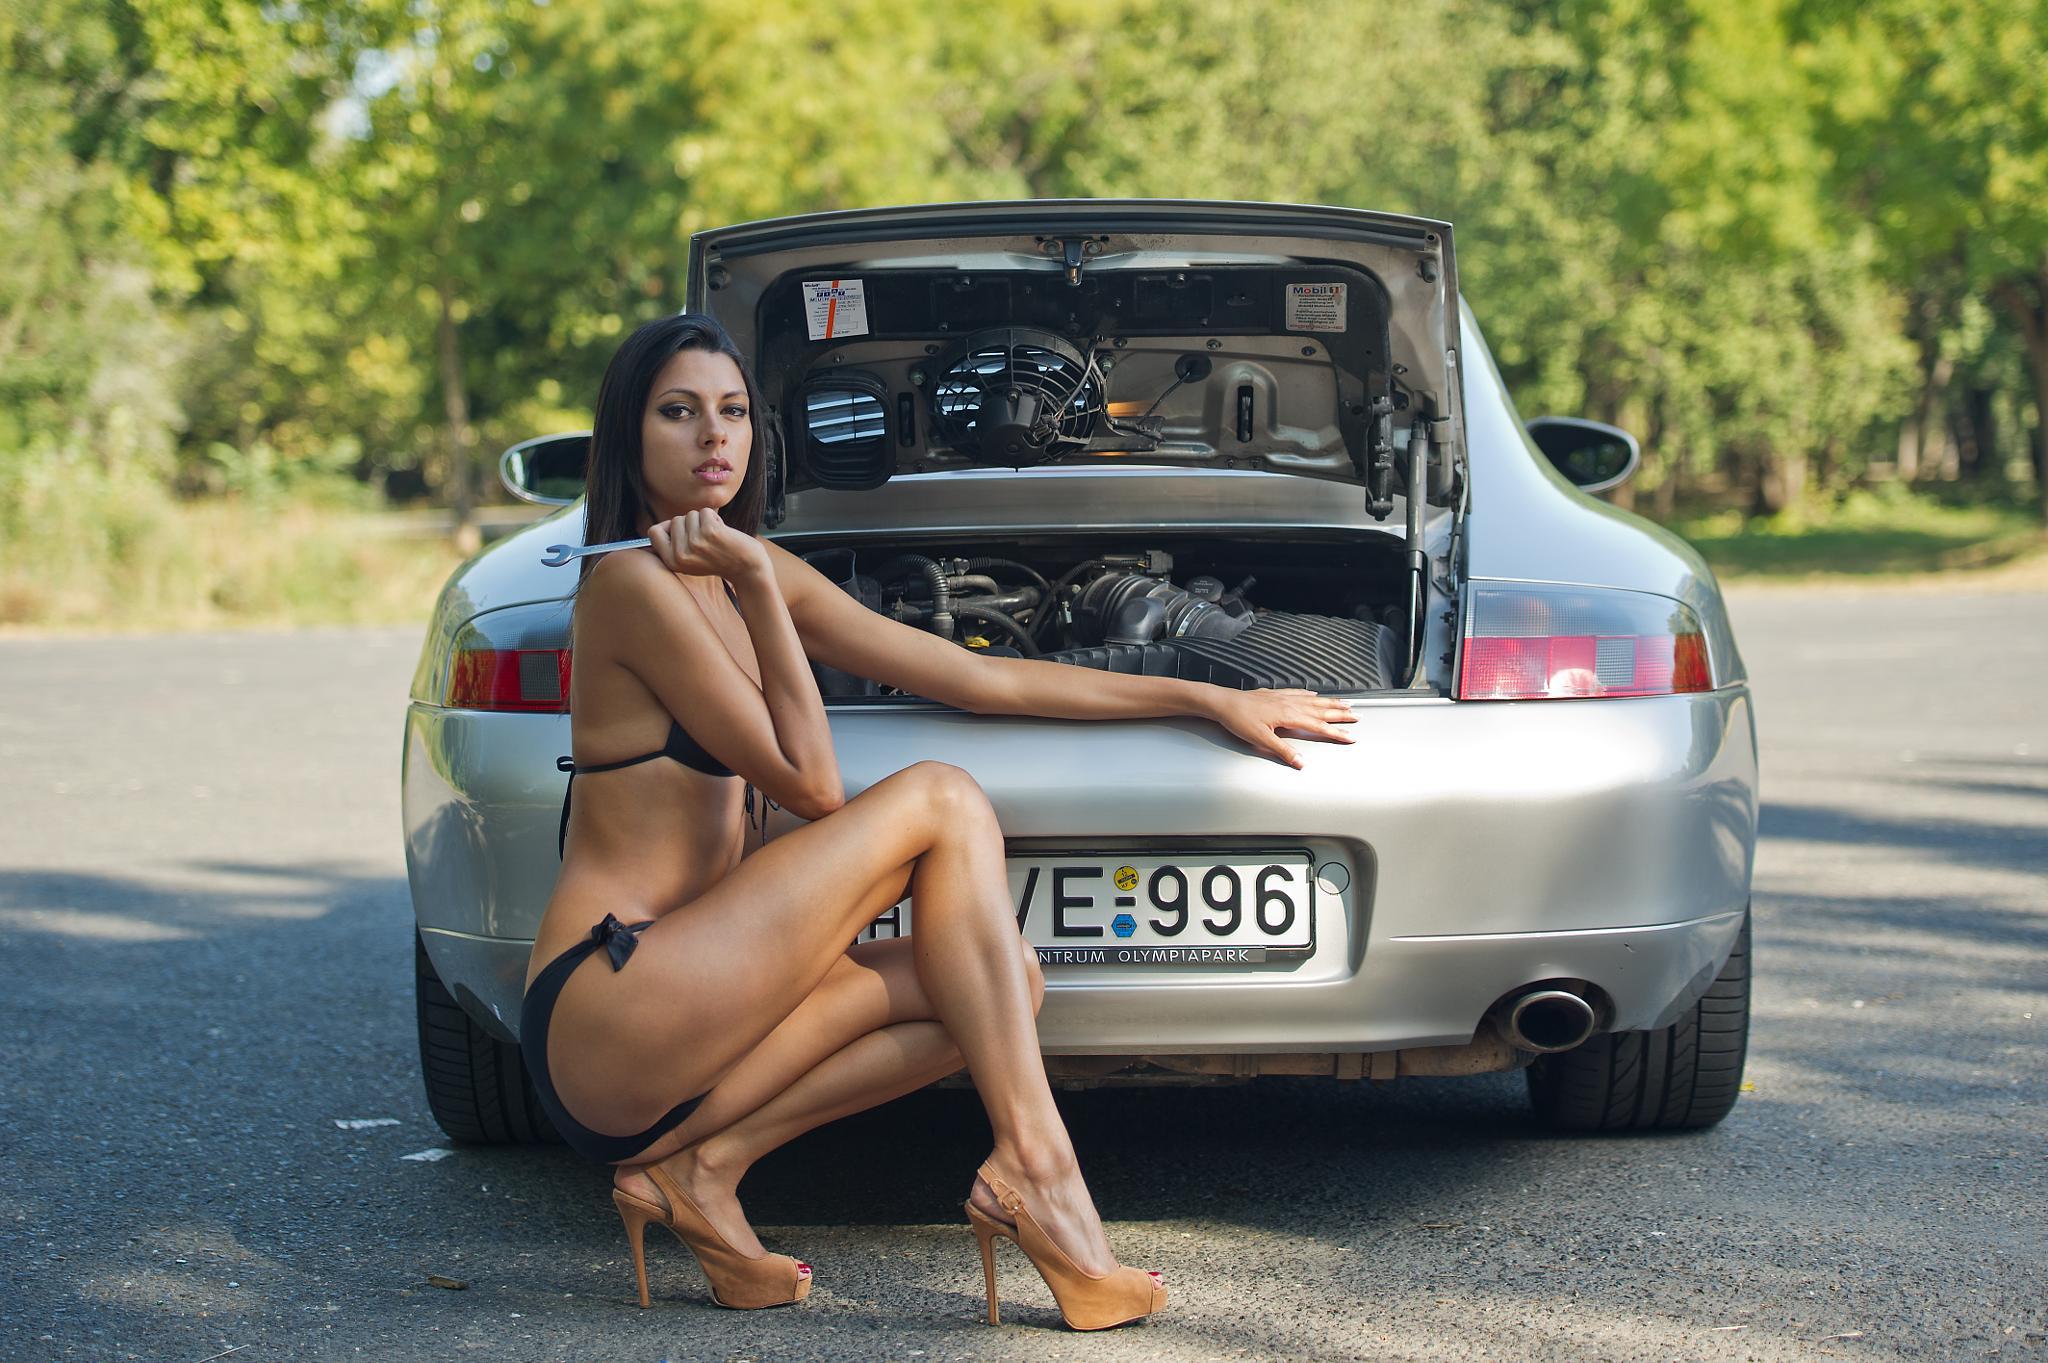 Porsche girl by jozseftoth